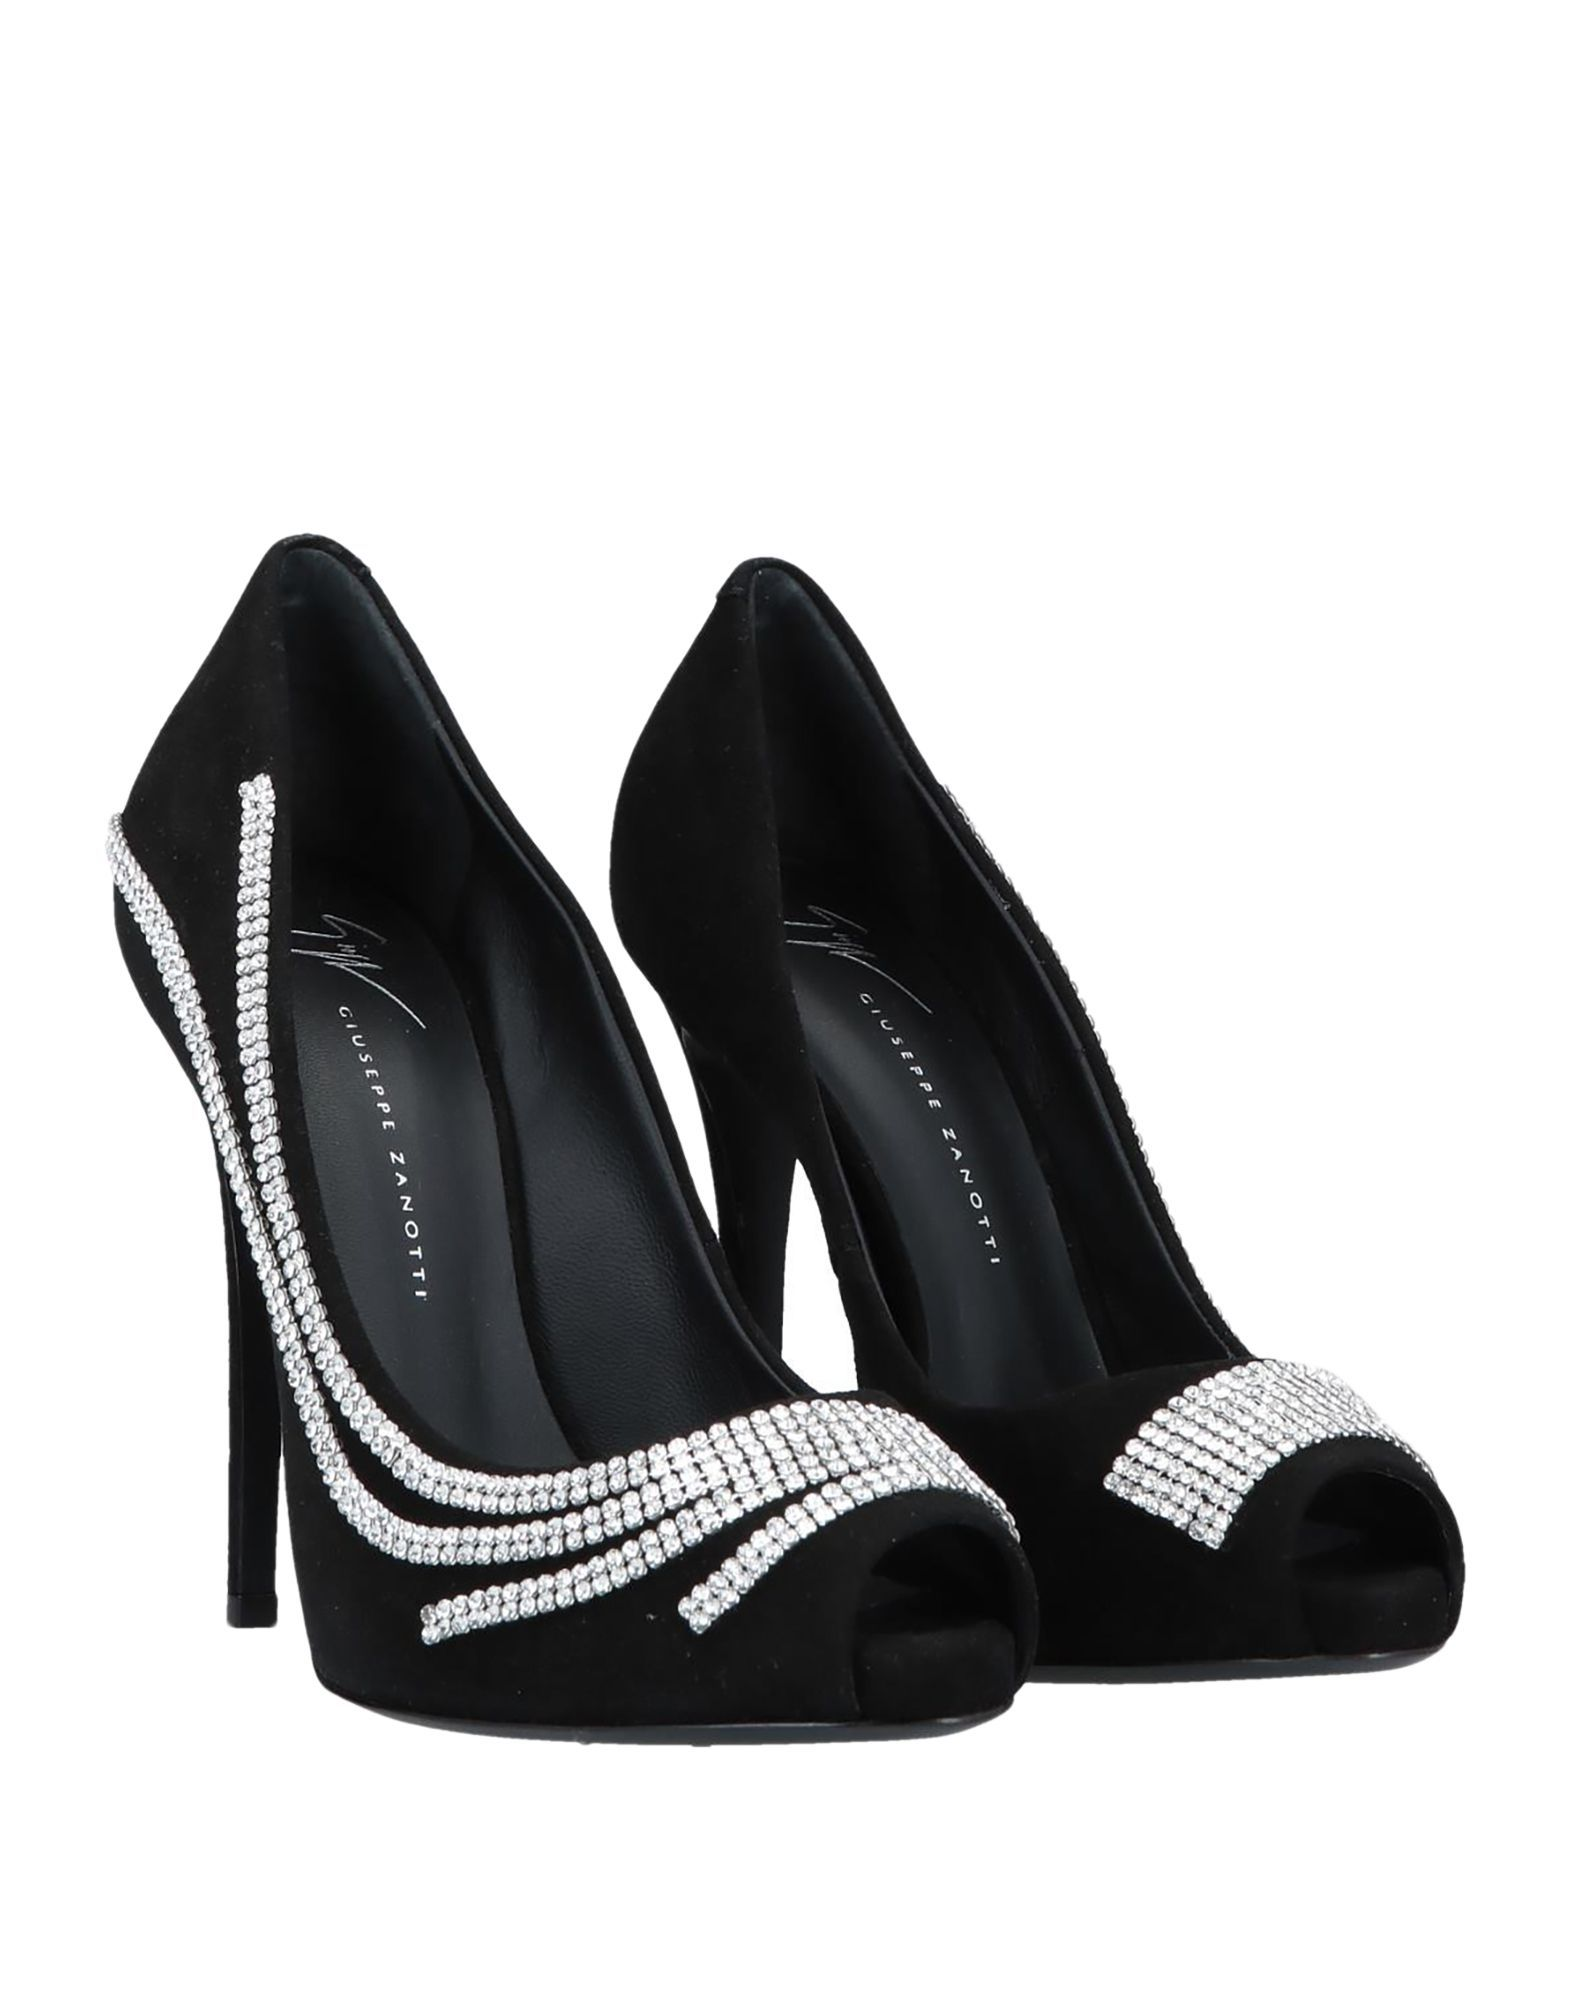 Giuseppe Zanotti Black Leather Peeptoe Heels